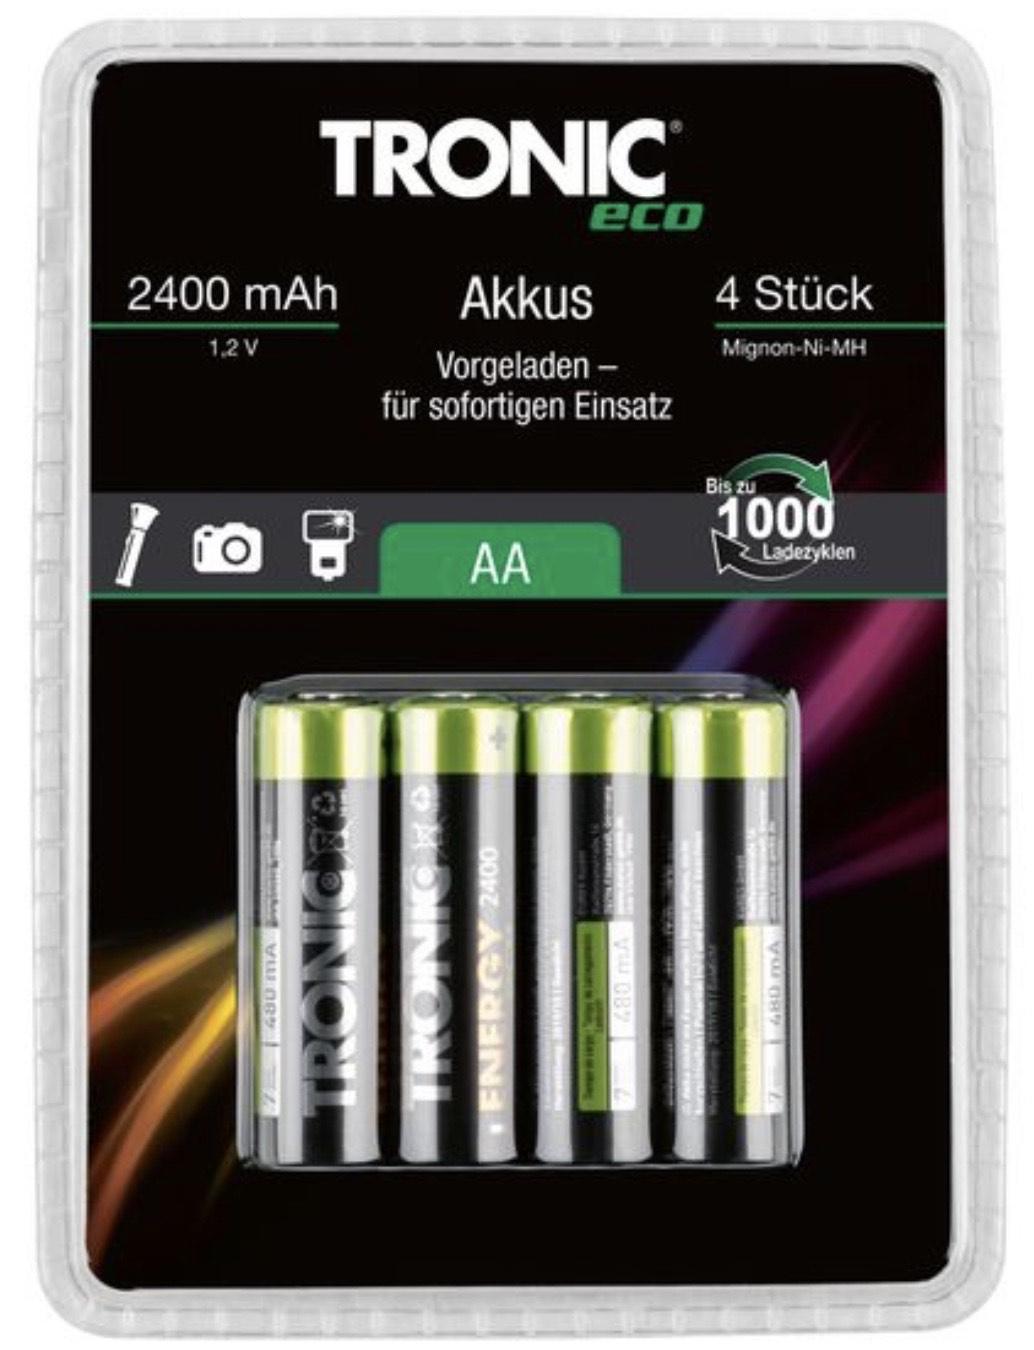 Lidl Tronic Akkus Ready to use AA und AAA im Markt und online